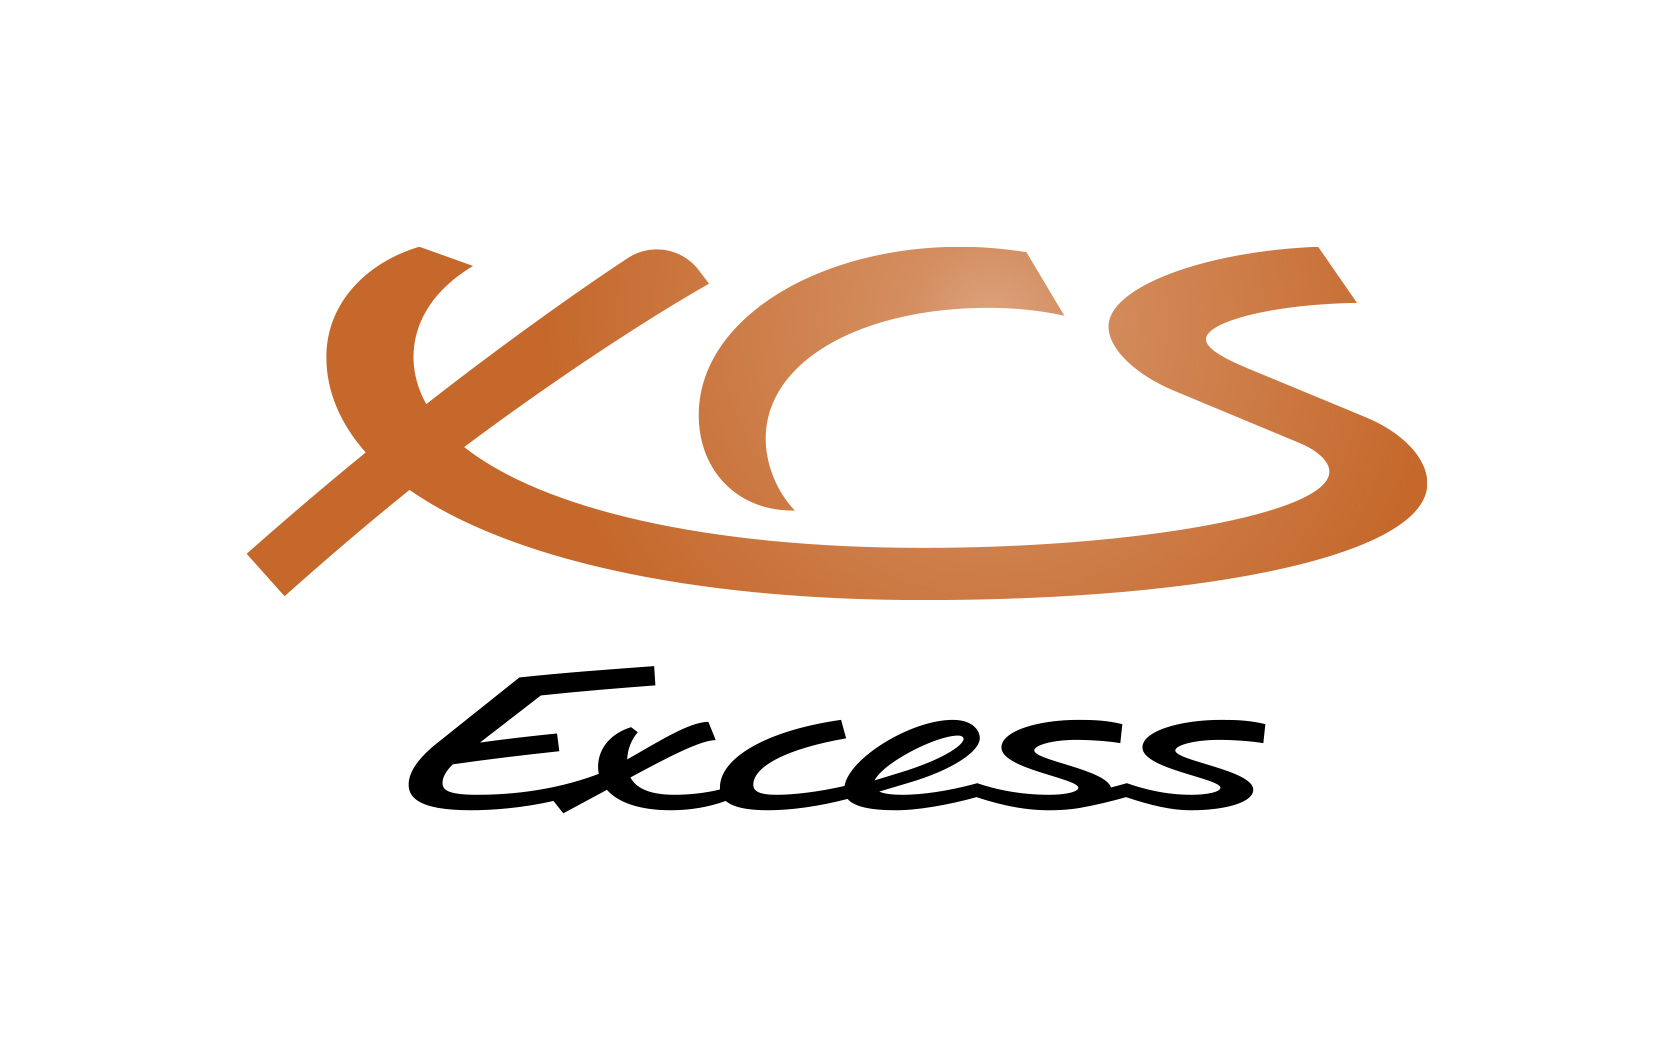 EXCESS-71916f17-0bb5-408f-9436-5c1c59527400